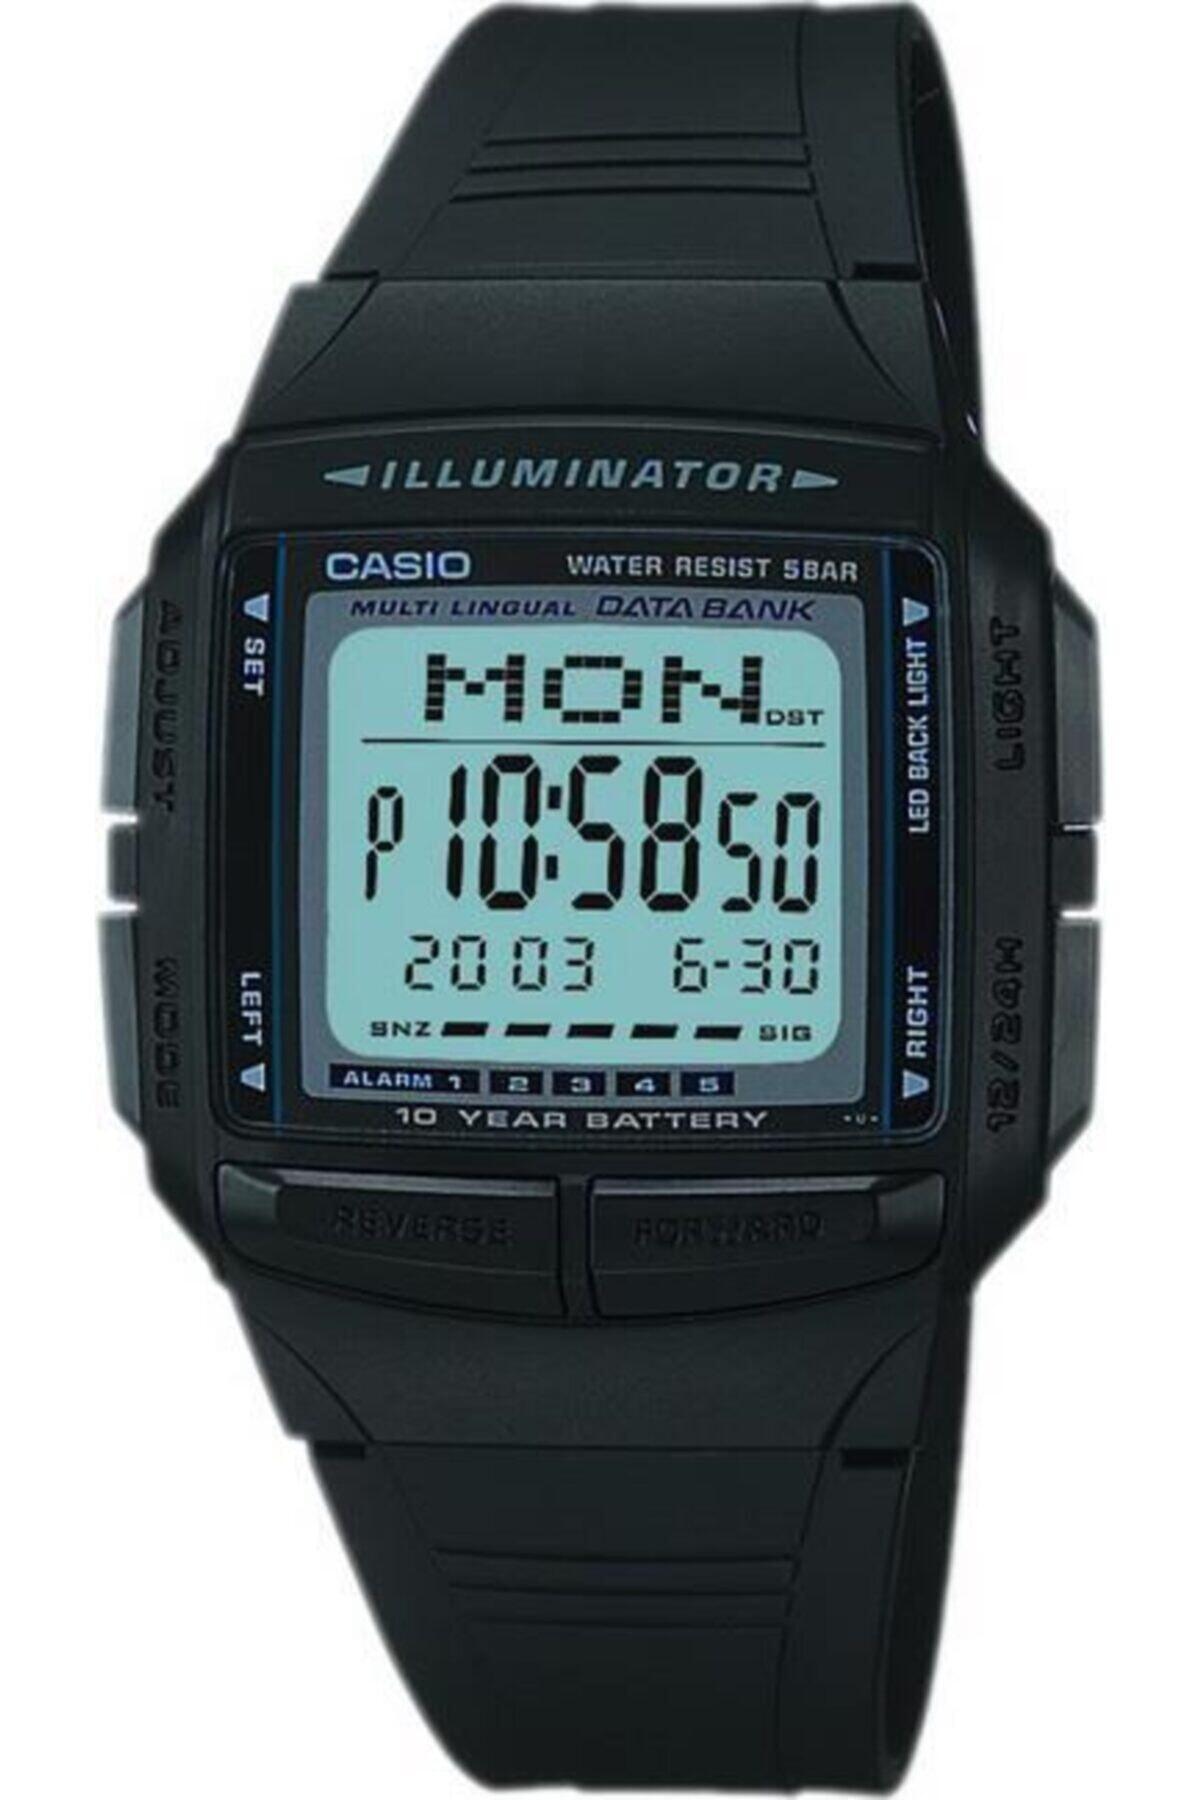 Casio Cas-db361avdf Dijital-data Bank Kol Saati 1